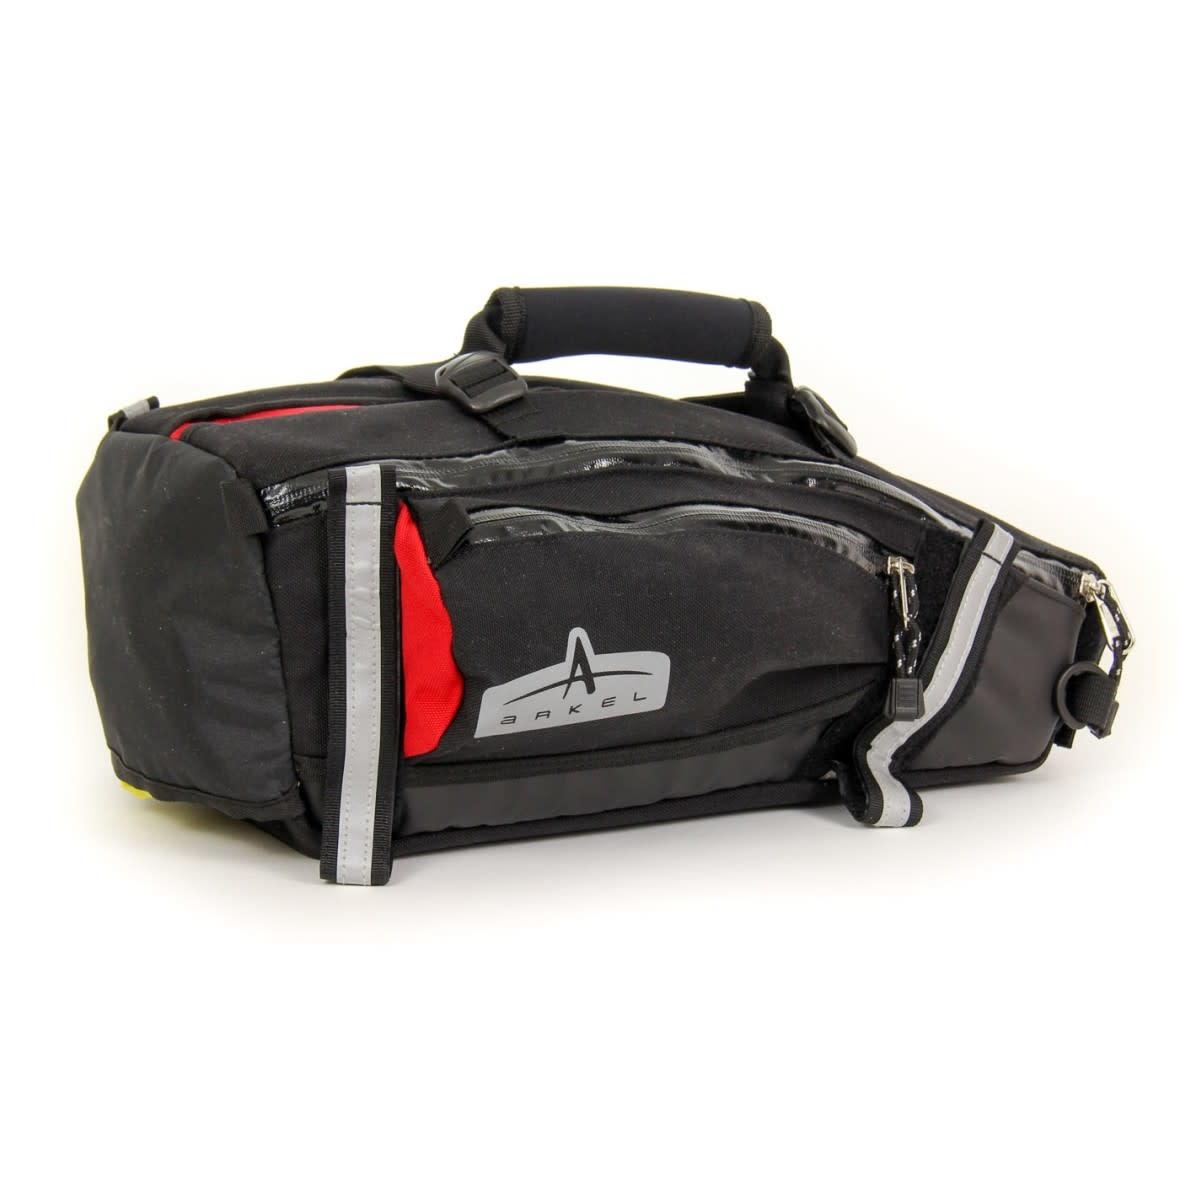 Arkel Arkel Tailrider Trunk Bag